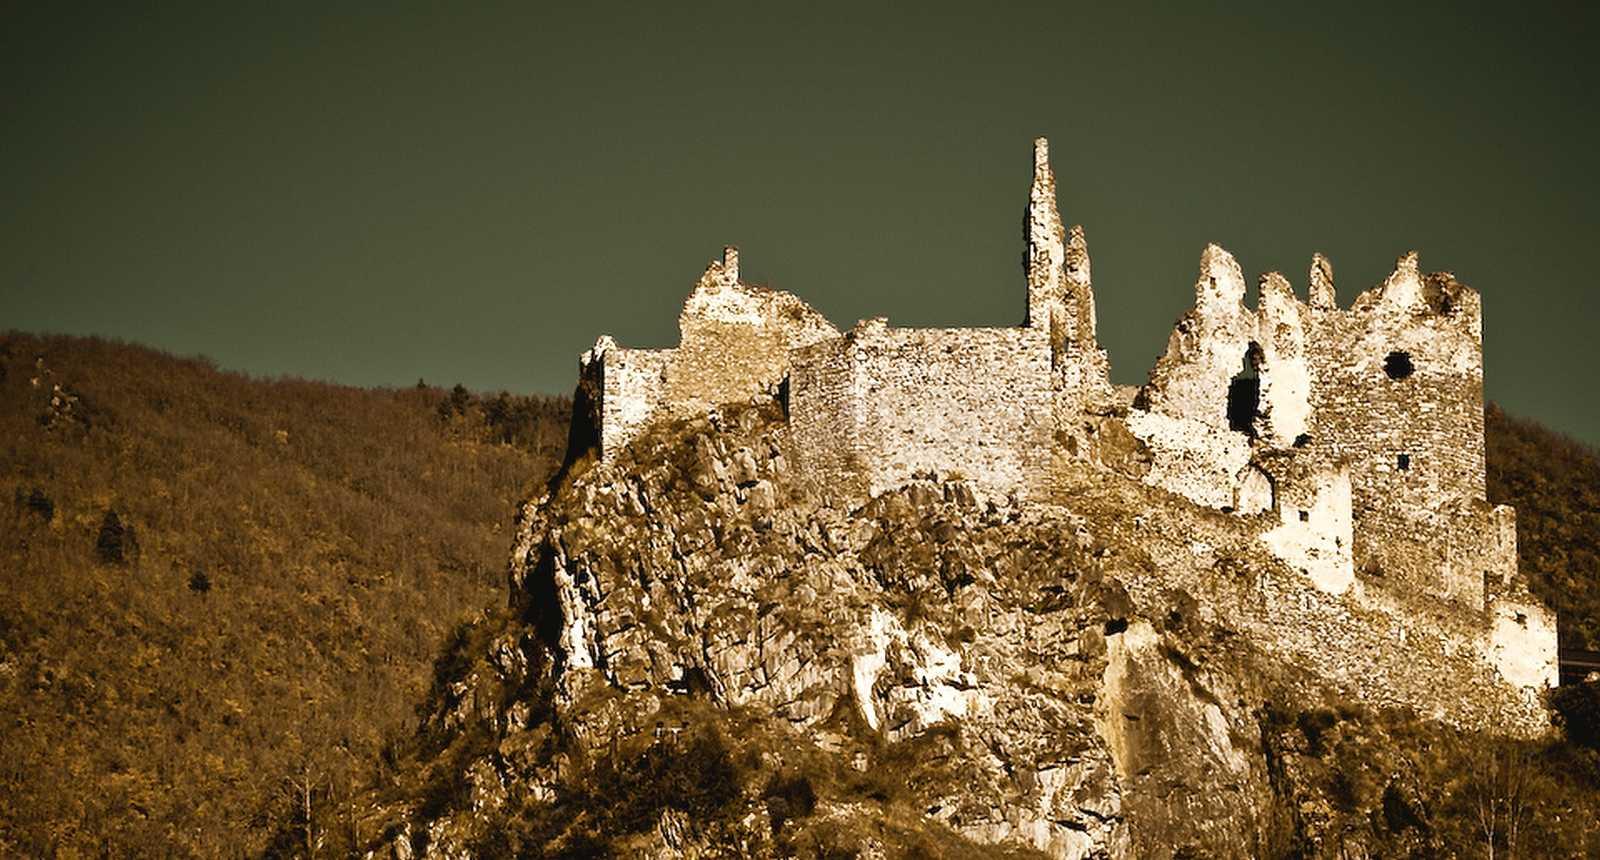 Les ruines du Château cathare d'Usson